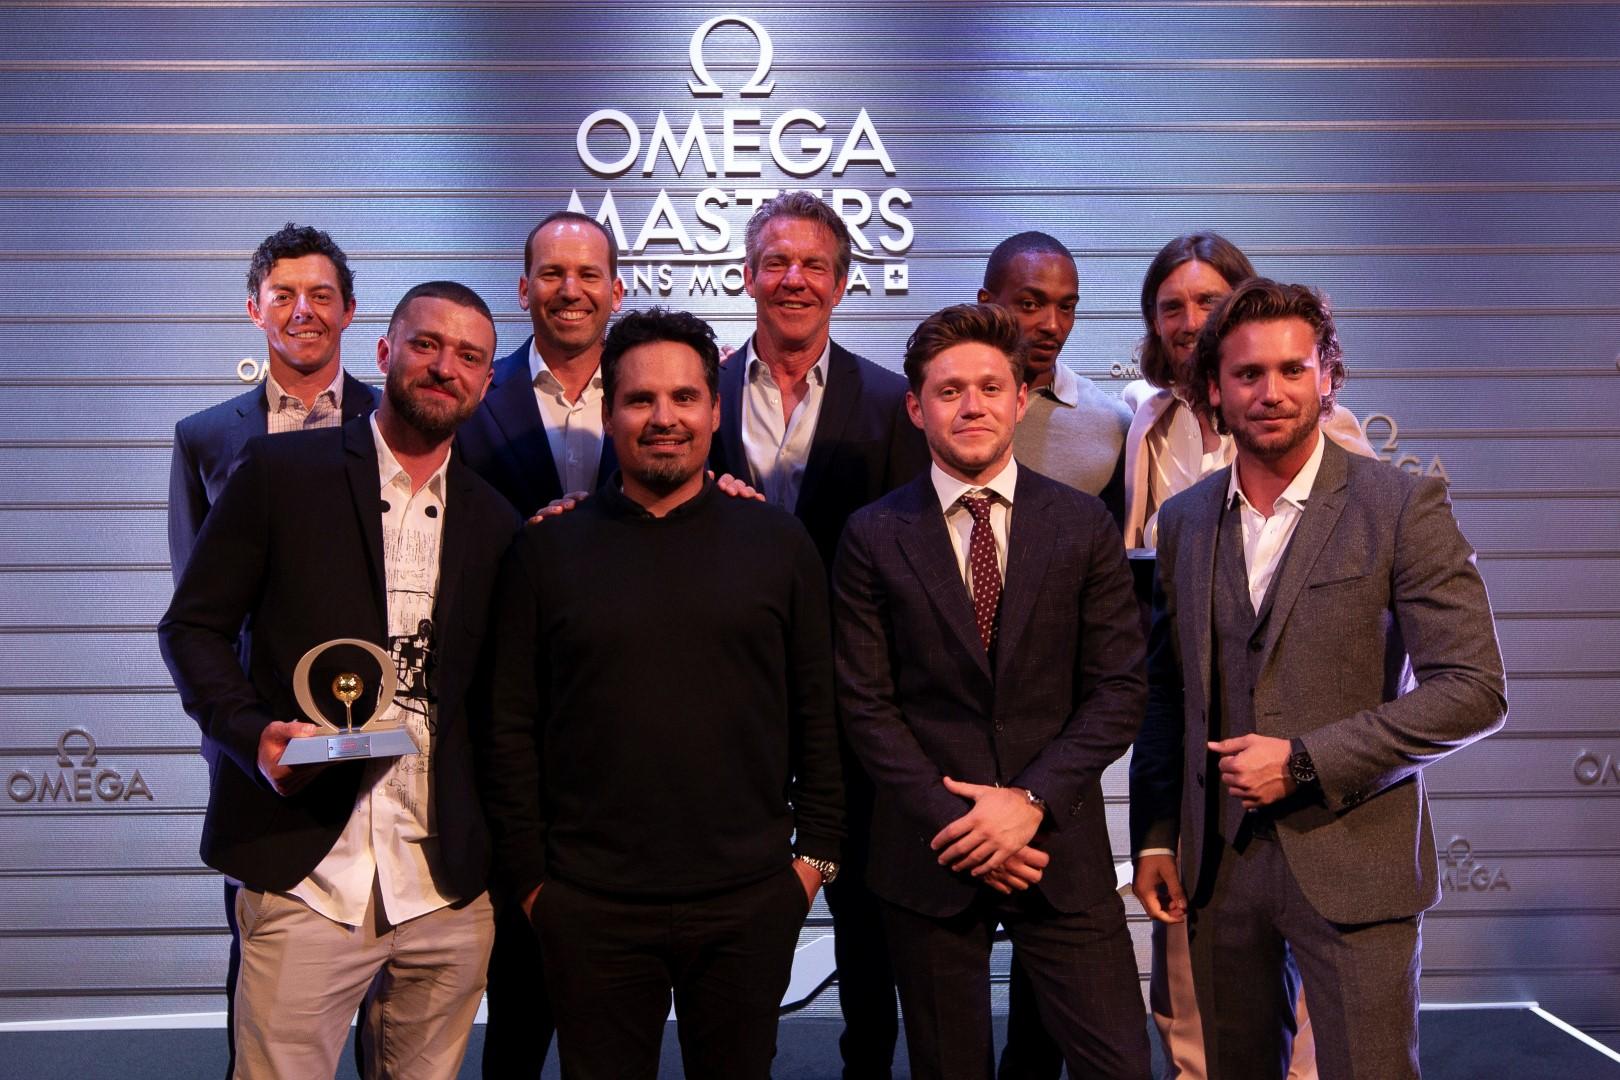 Omega Celebrity Masters 2019